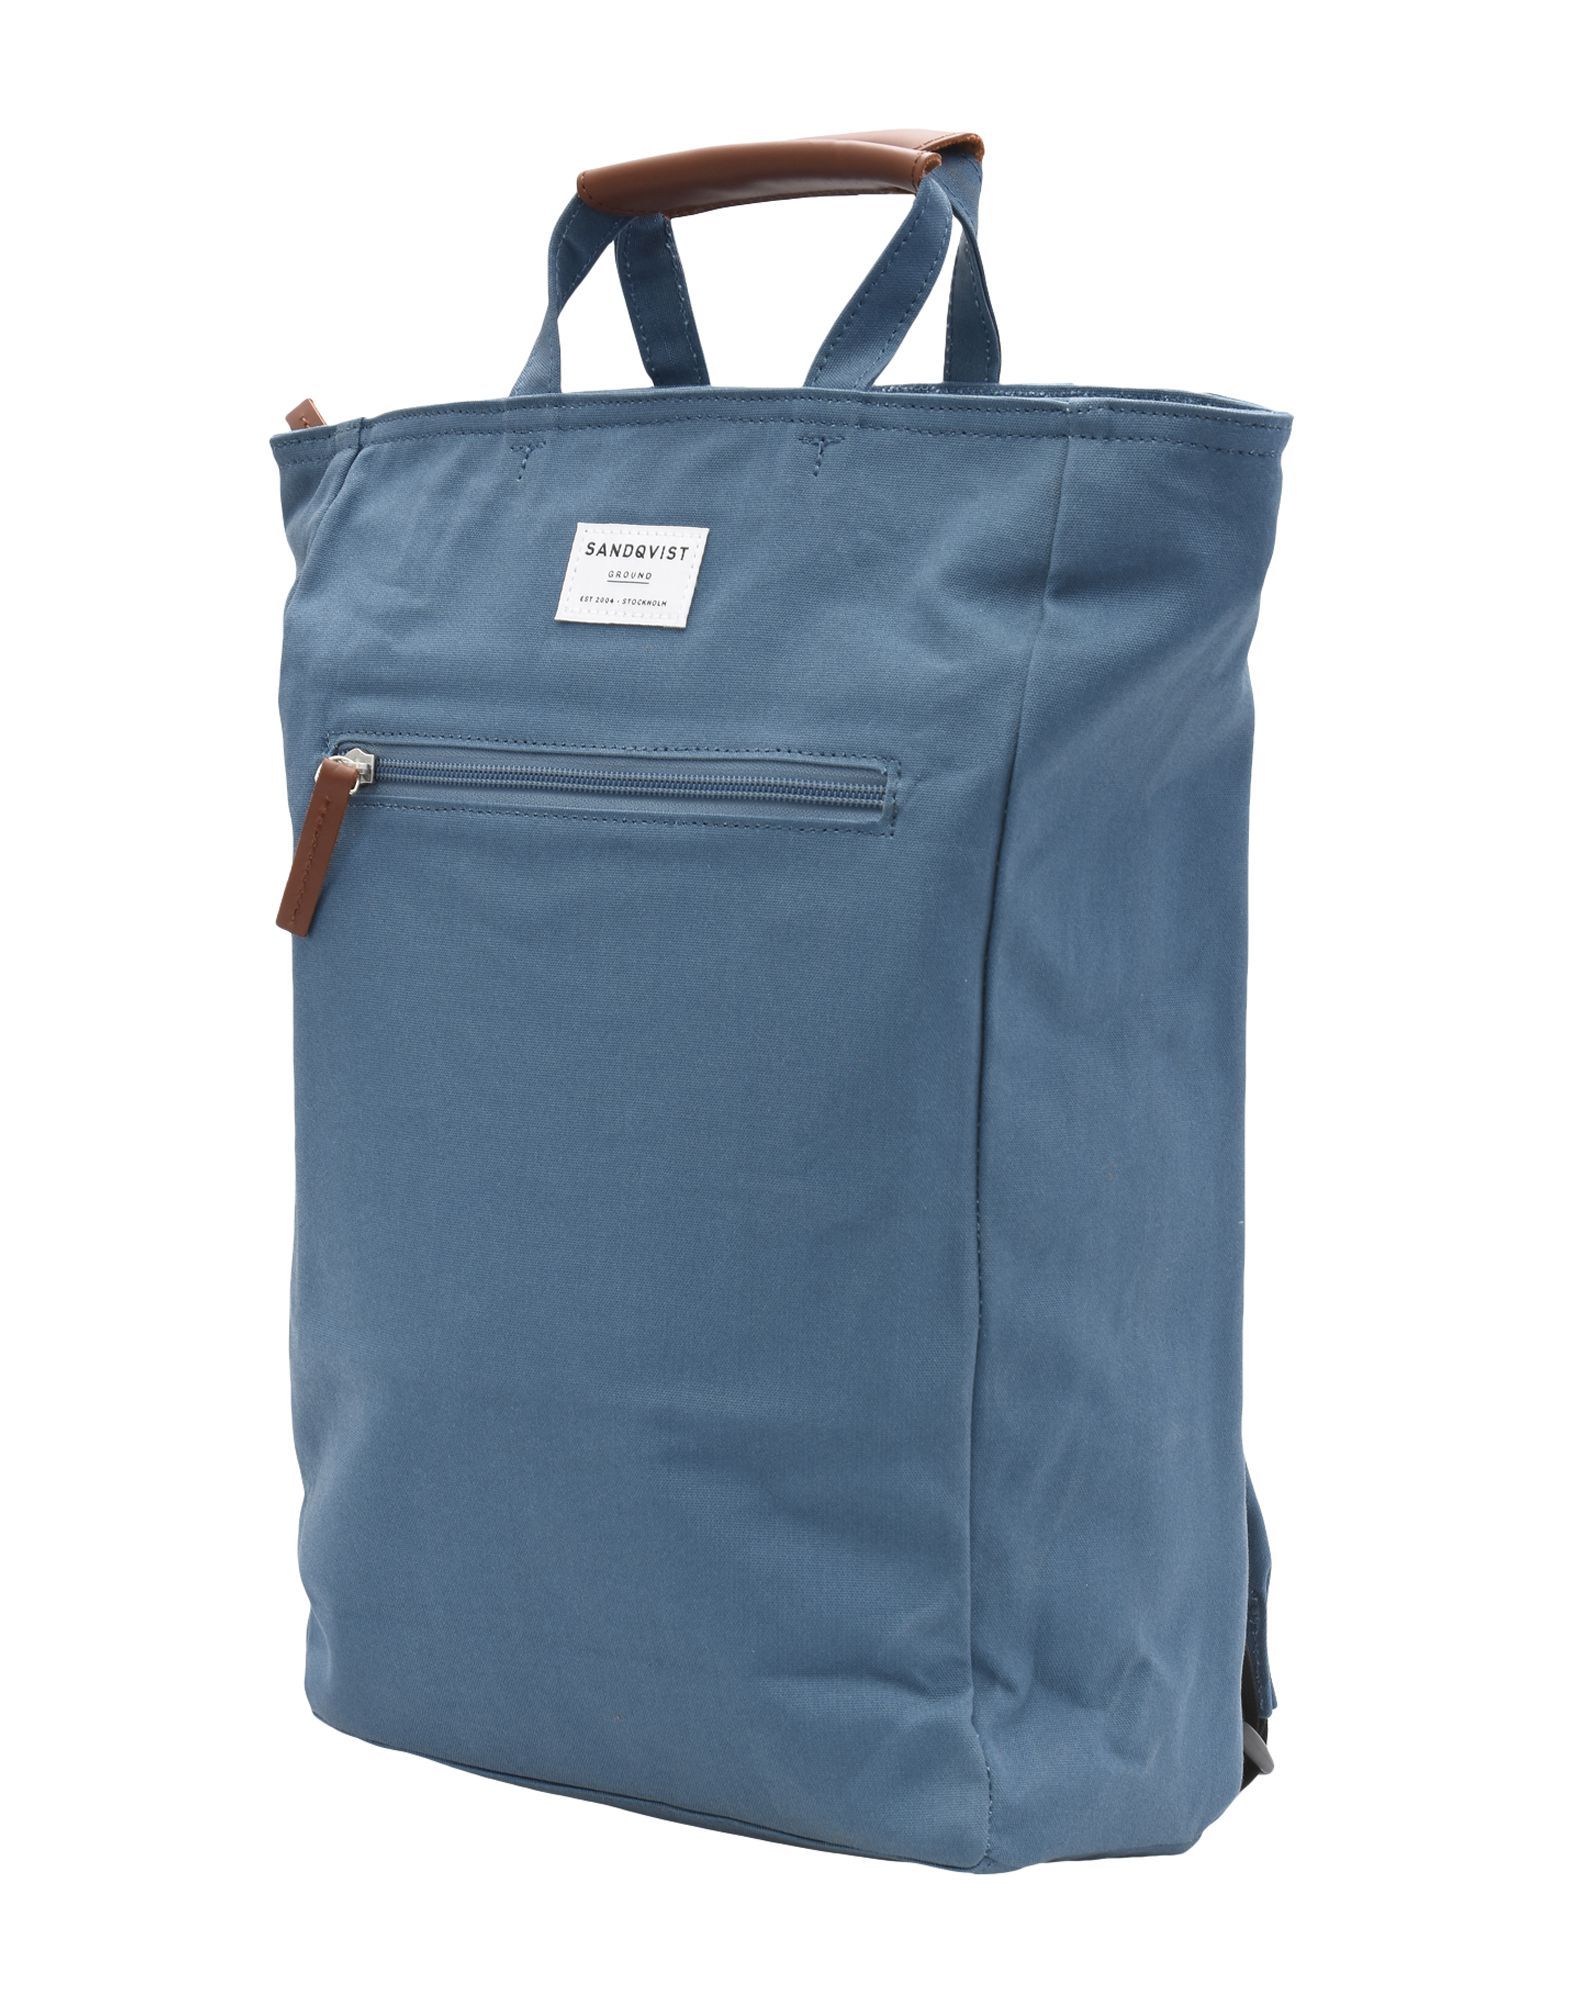 SANDQVIST Backpack & Fanny Pack in Blue